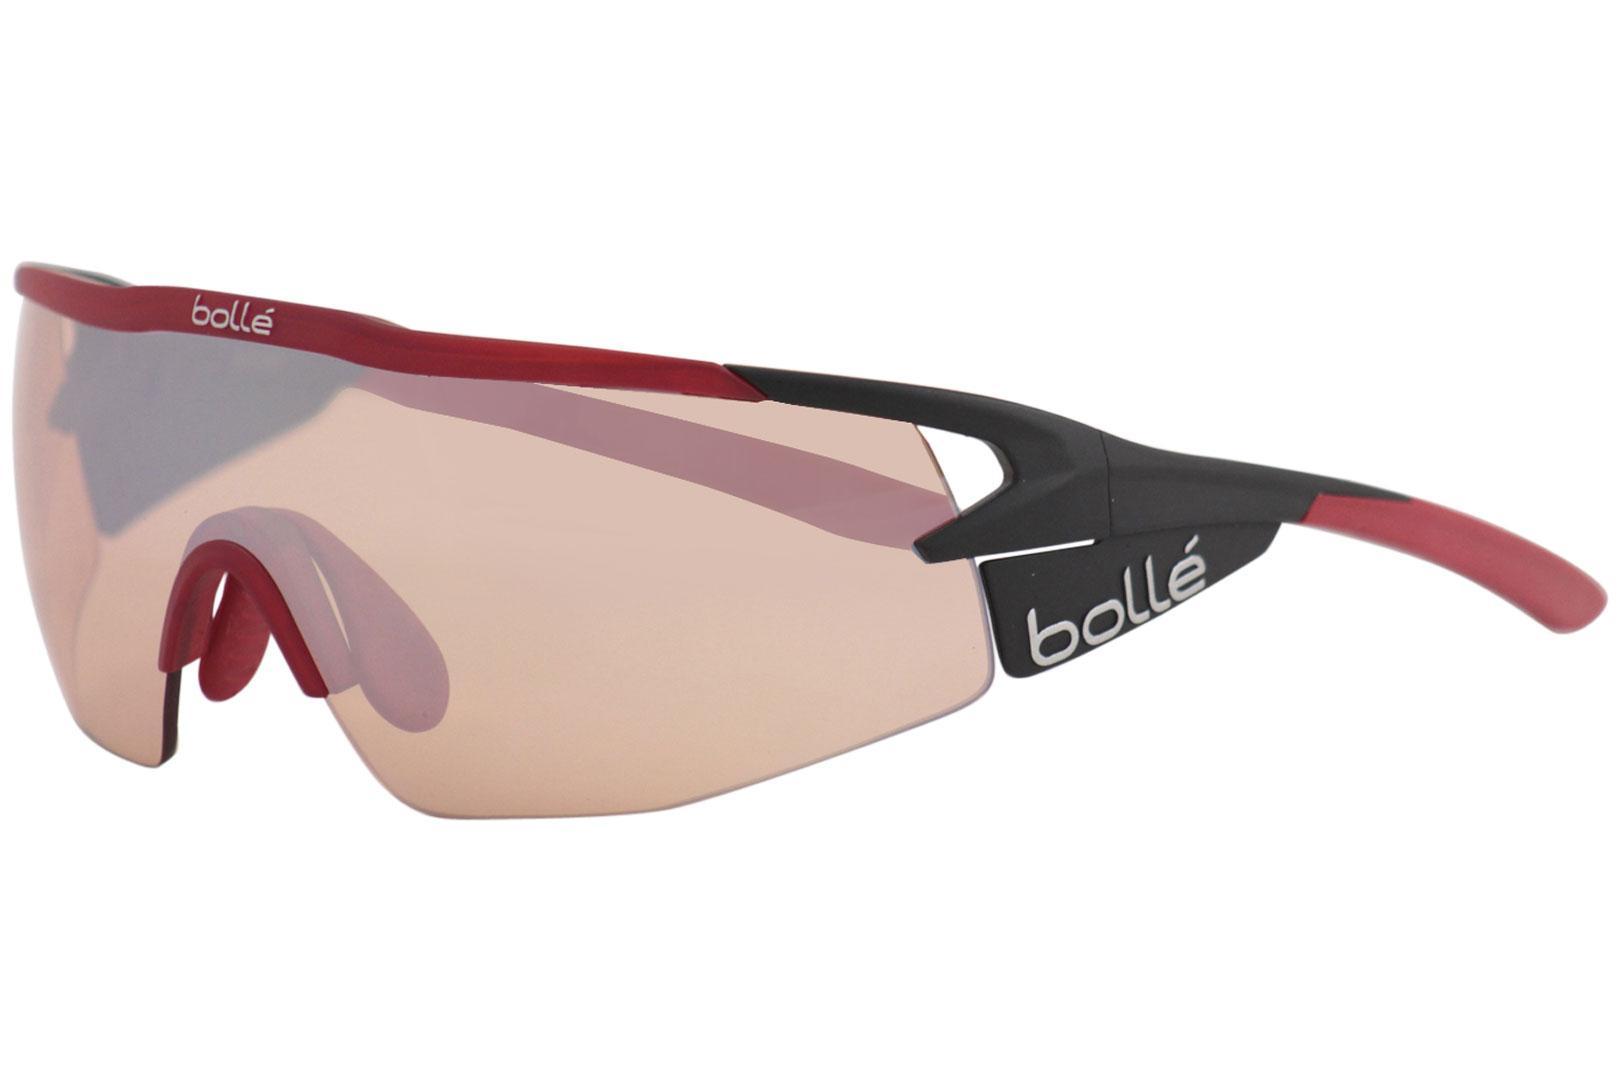 8a9f46b811e0d Bolle Men s Aeromax 12268 Matte Black Red Sport Shield Wrap ...